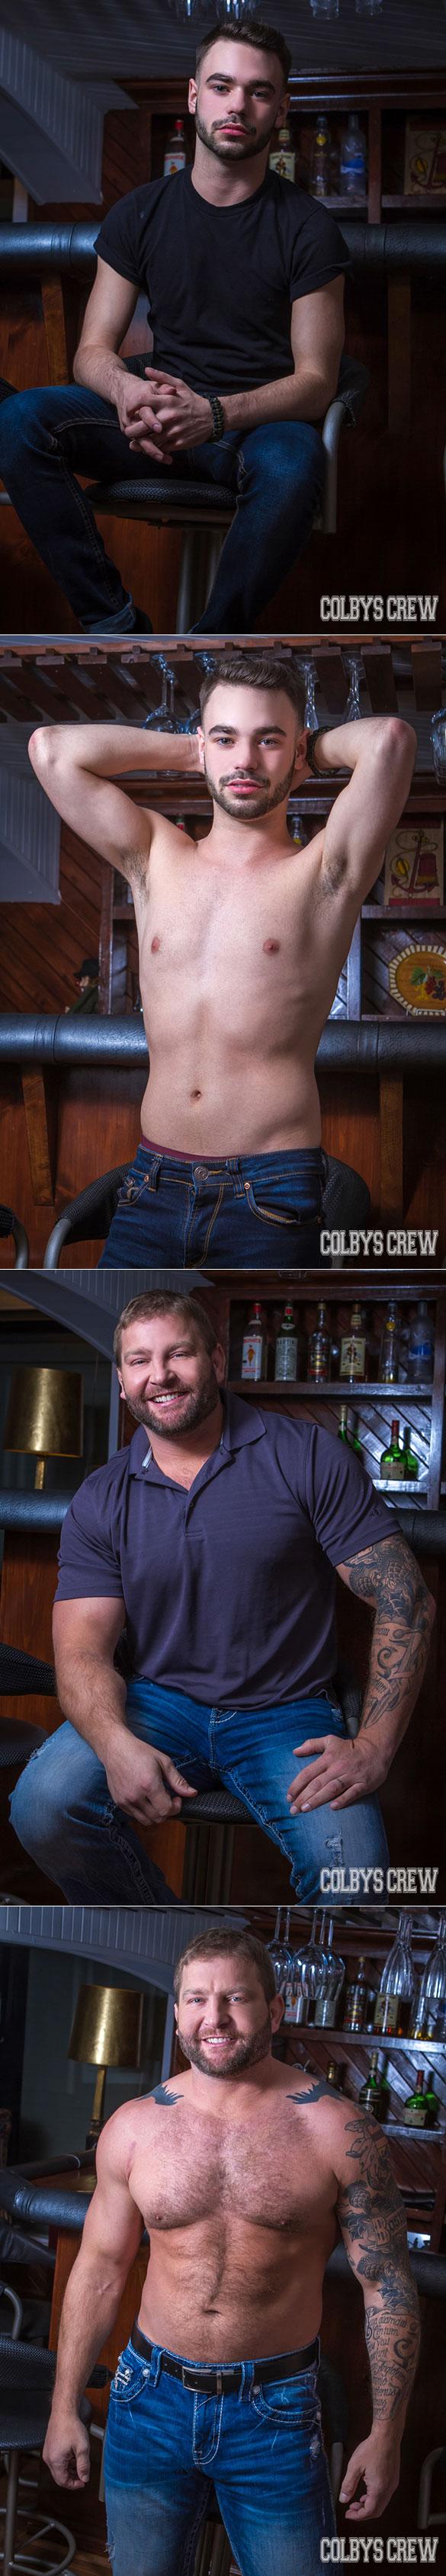 Colby's Crew: Colby Jansen fucks Zac Hunter Cabin Buddies, Part 1